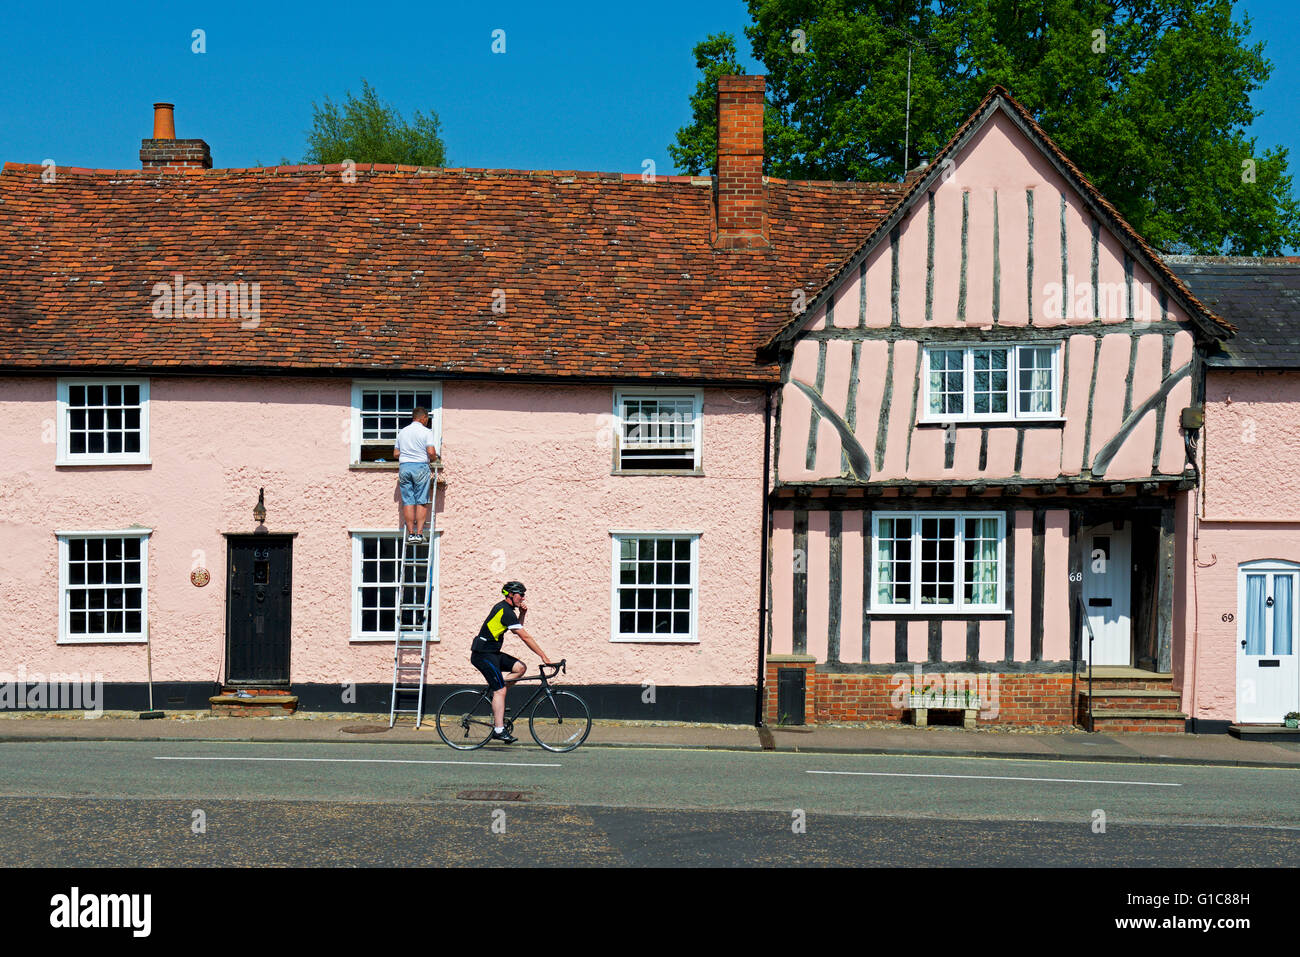 Man on ladder, repairing window frames on house in the village of Lavenham, Suffolk, England UK Stock Photo